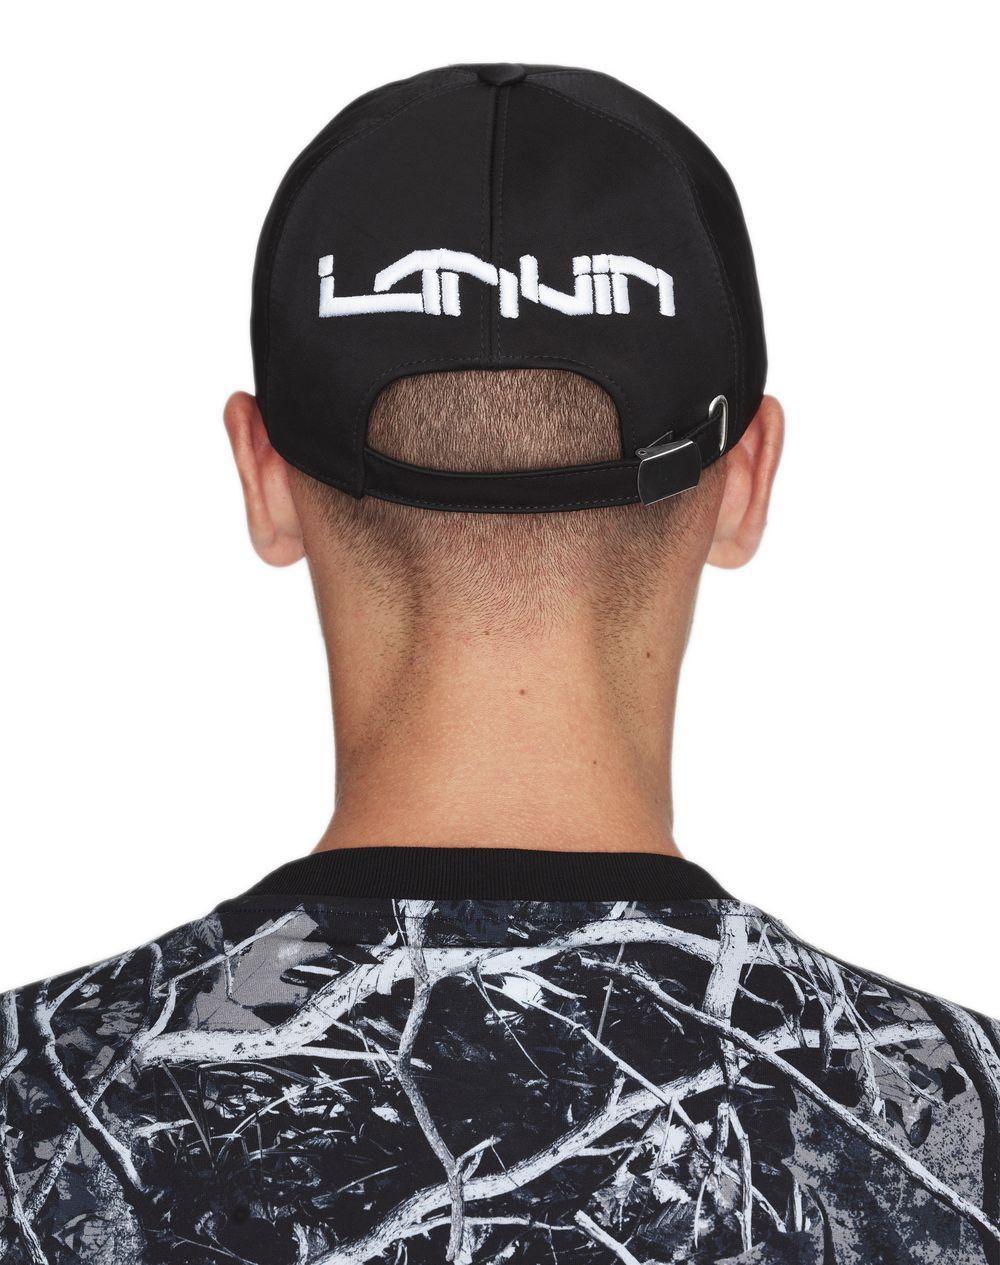 LANVIN NYLON CAP - Lanvin